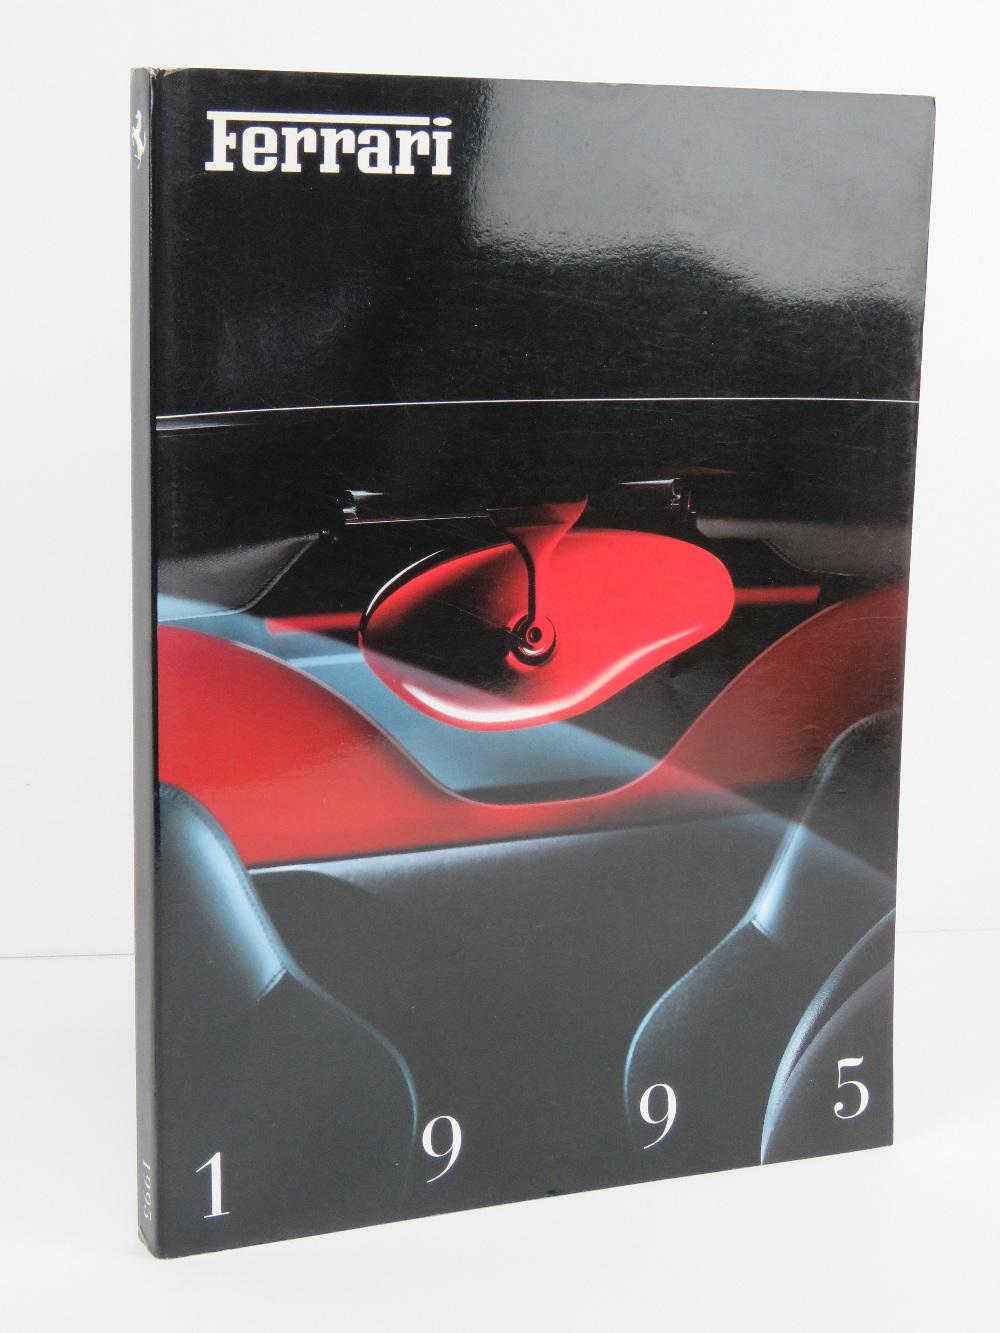 Ferrari Yearbook 1995. English edition. Softback book.